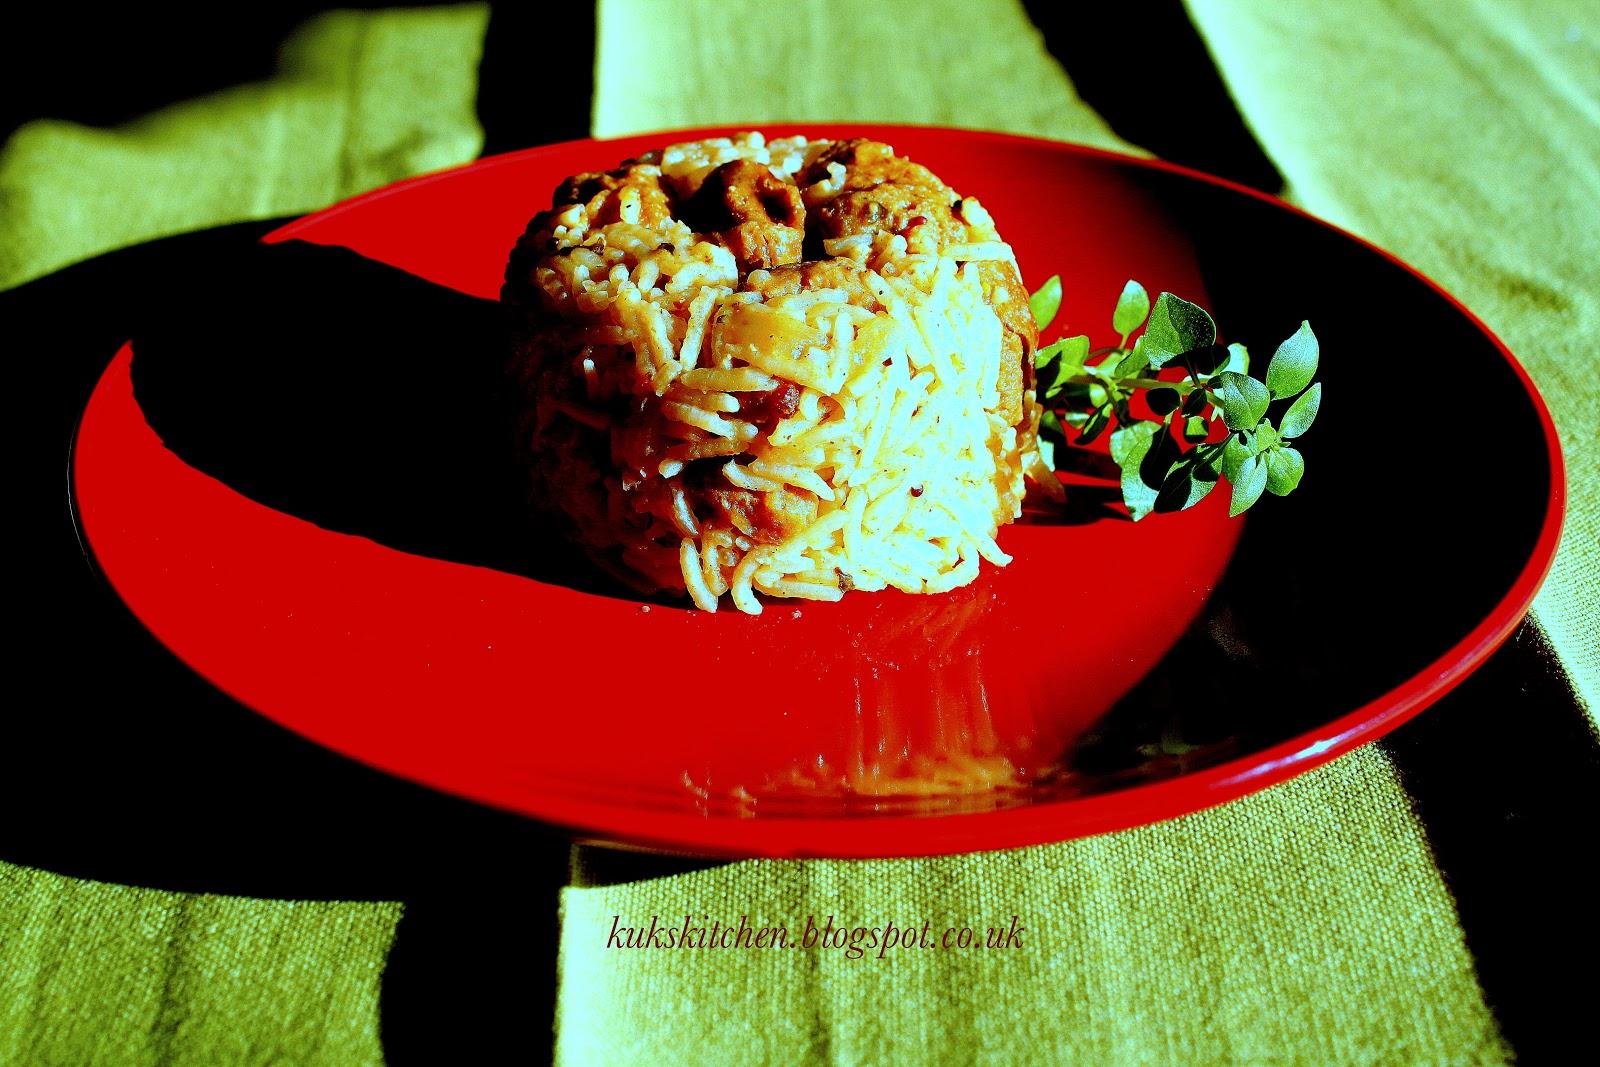 Microwave Cake Recipes In Malayalam: Kuk's Kitchen: Easy Kerala Malayali Syrian Christian